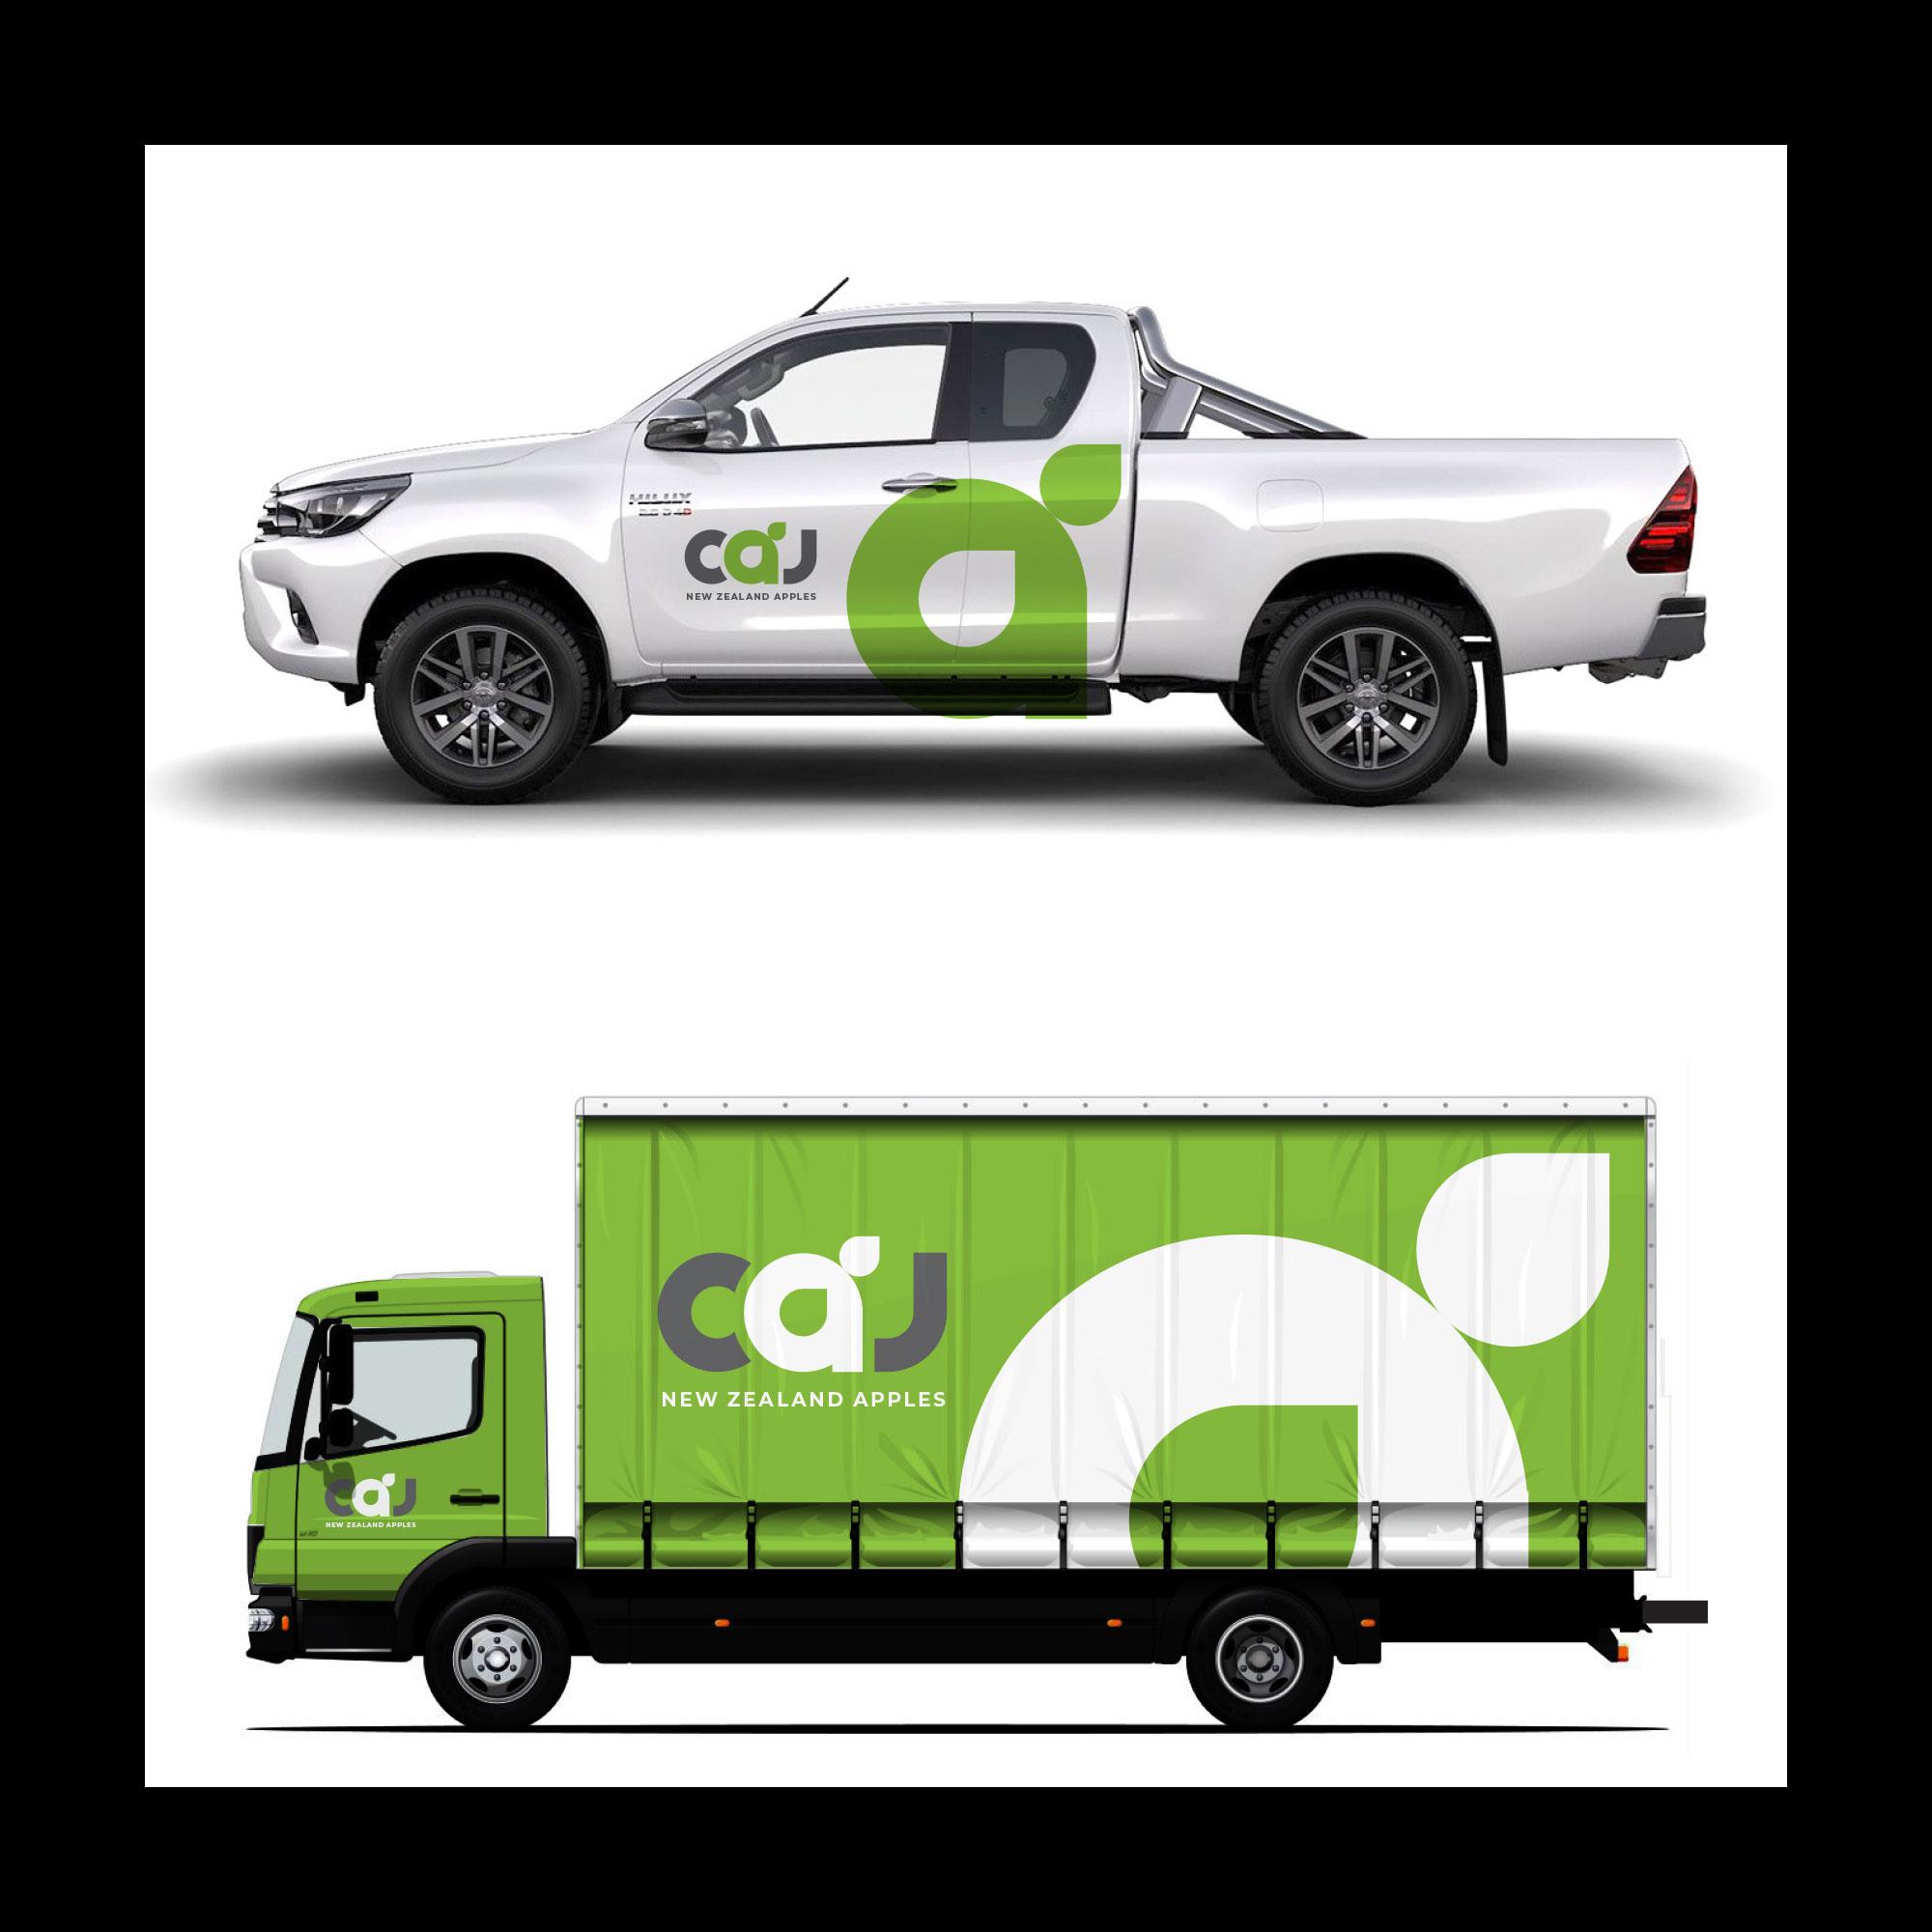 CAJ vehicle branding